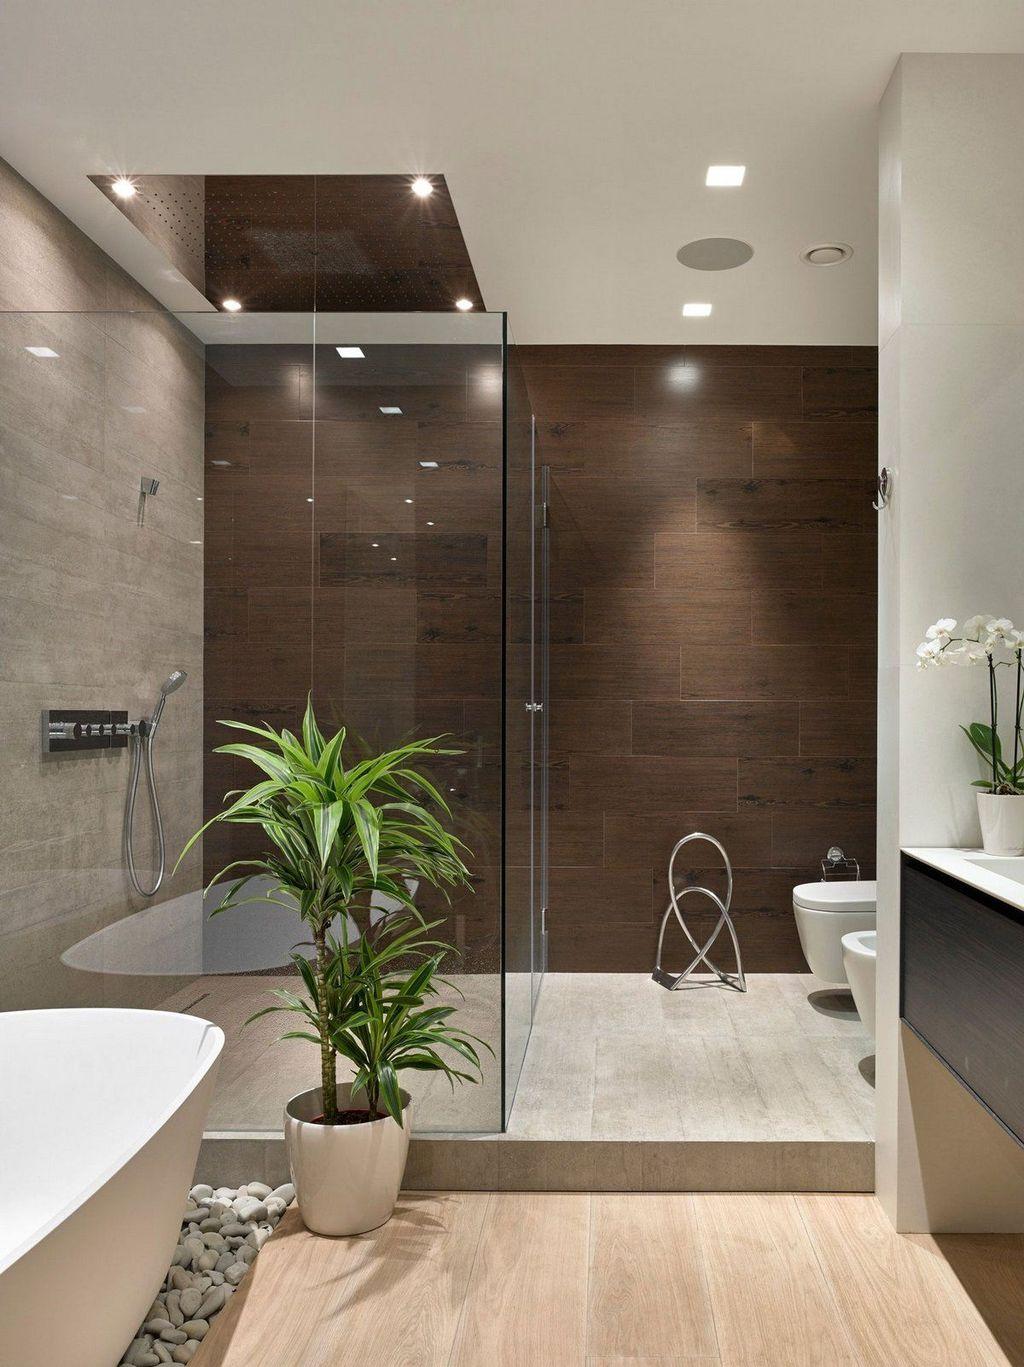 Unusual Bathroom Design Ideas You Need To Know 24